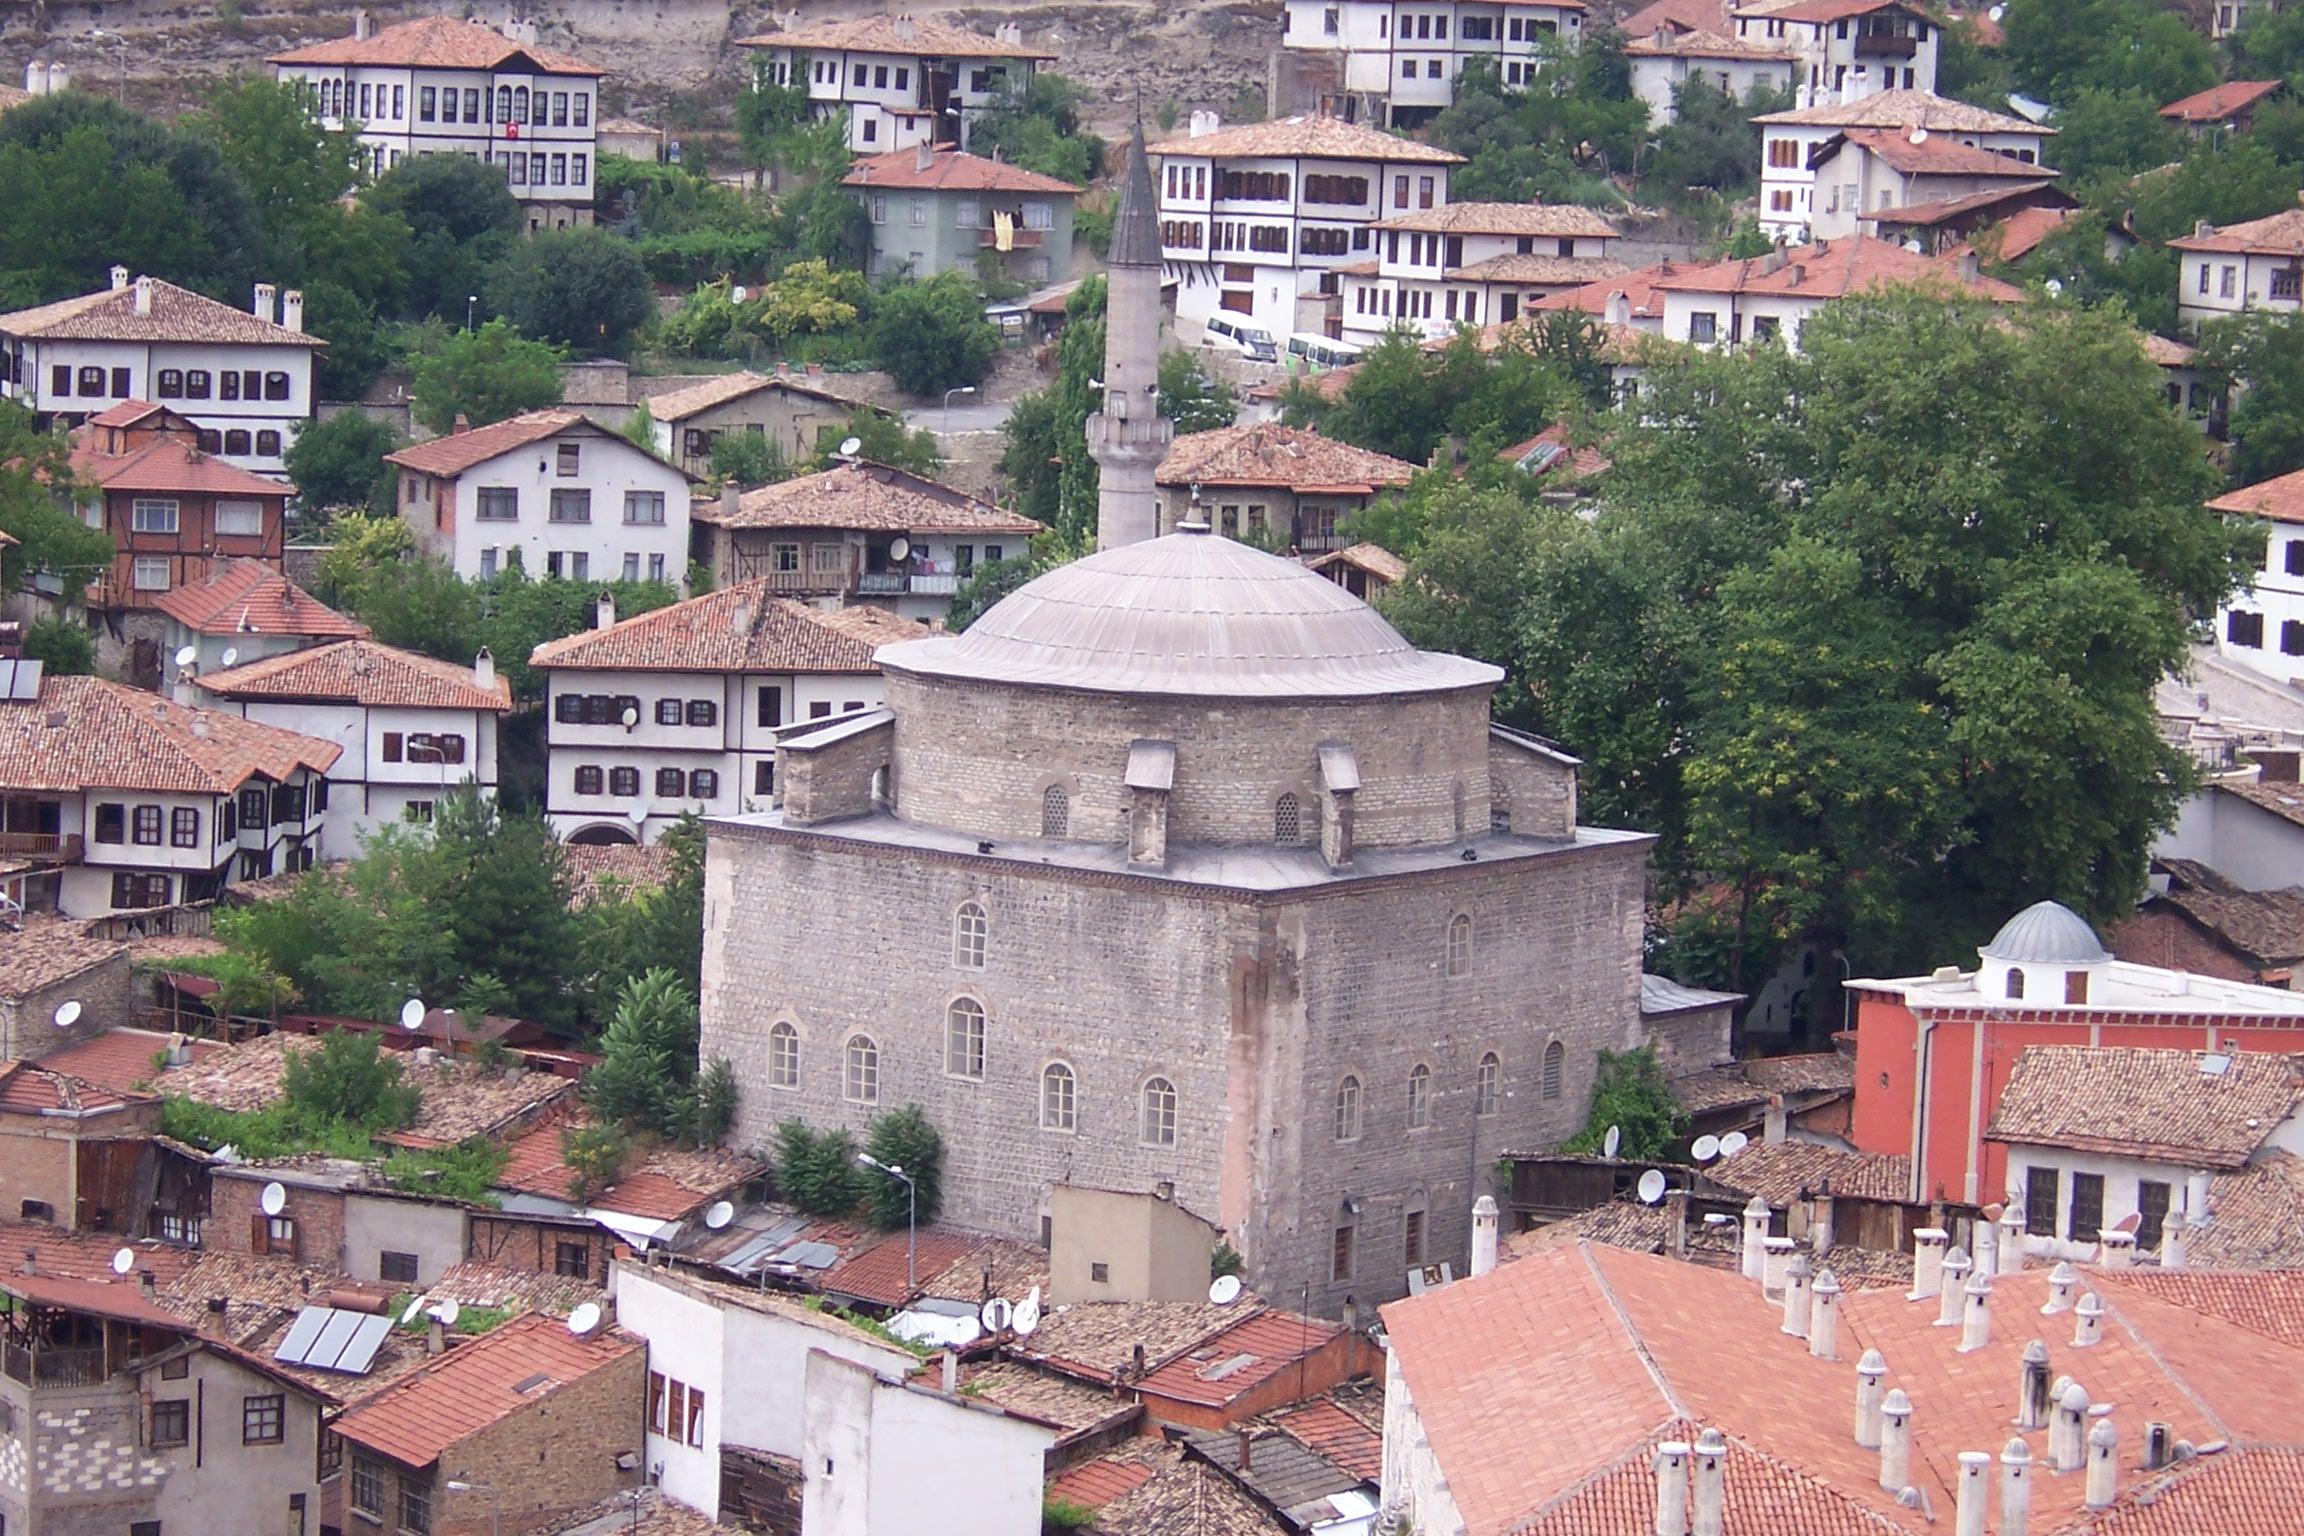 File:Köprülü Mehmet Paşa Camii.jpg - Wikimedia Commons